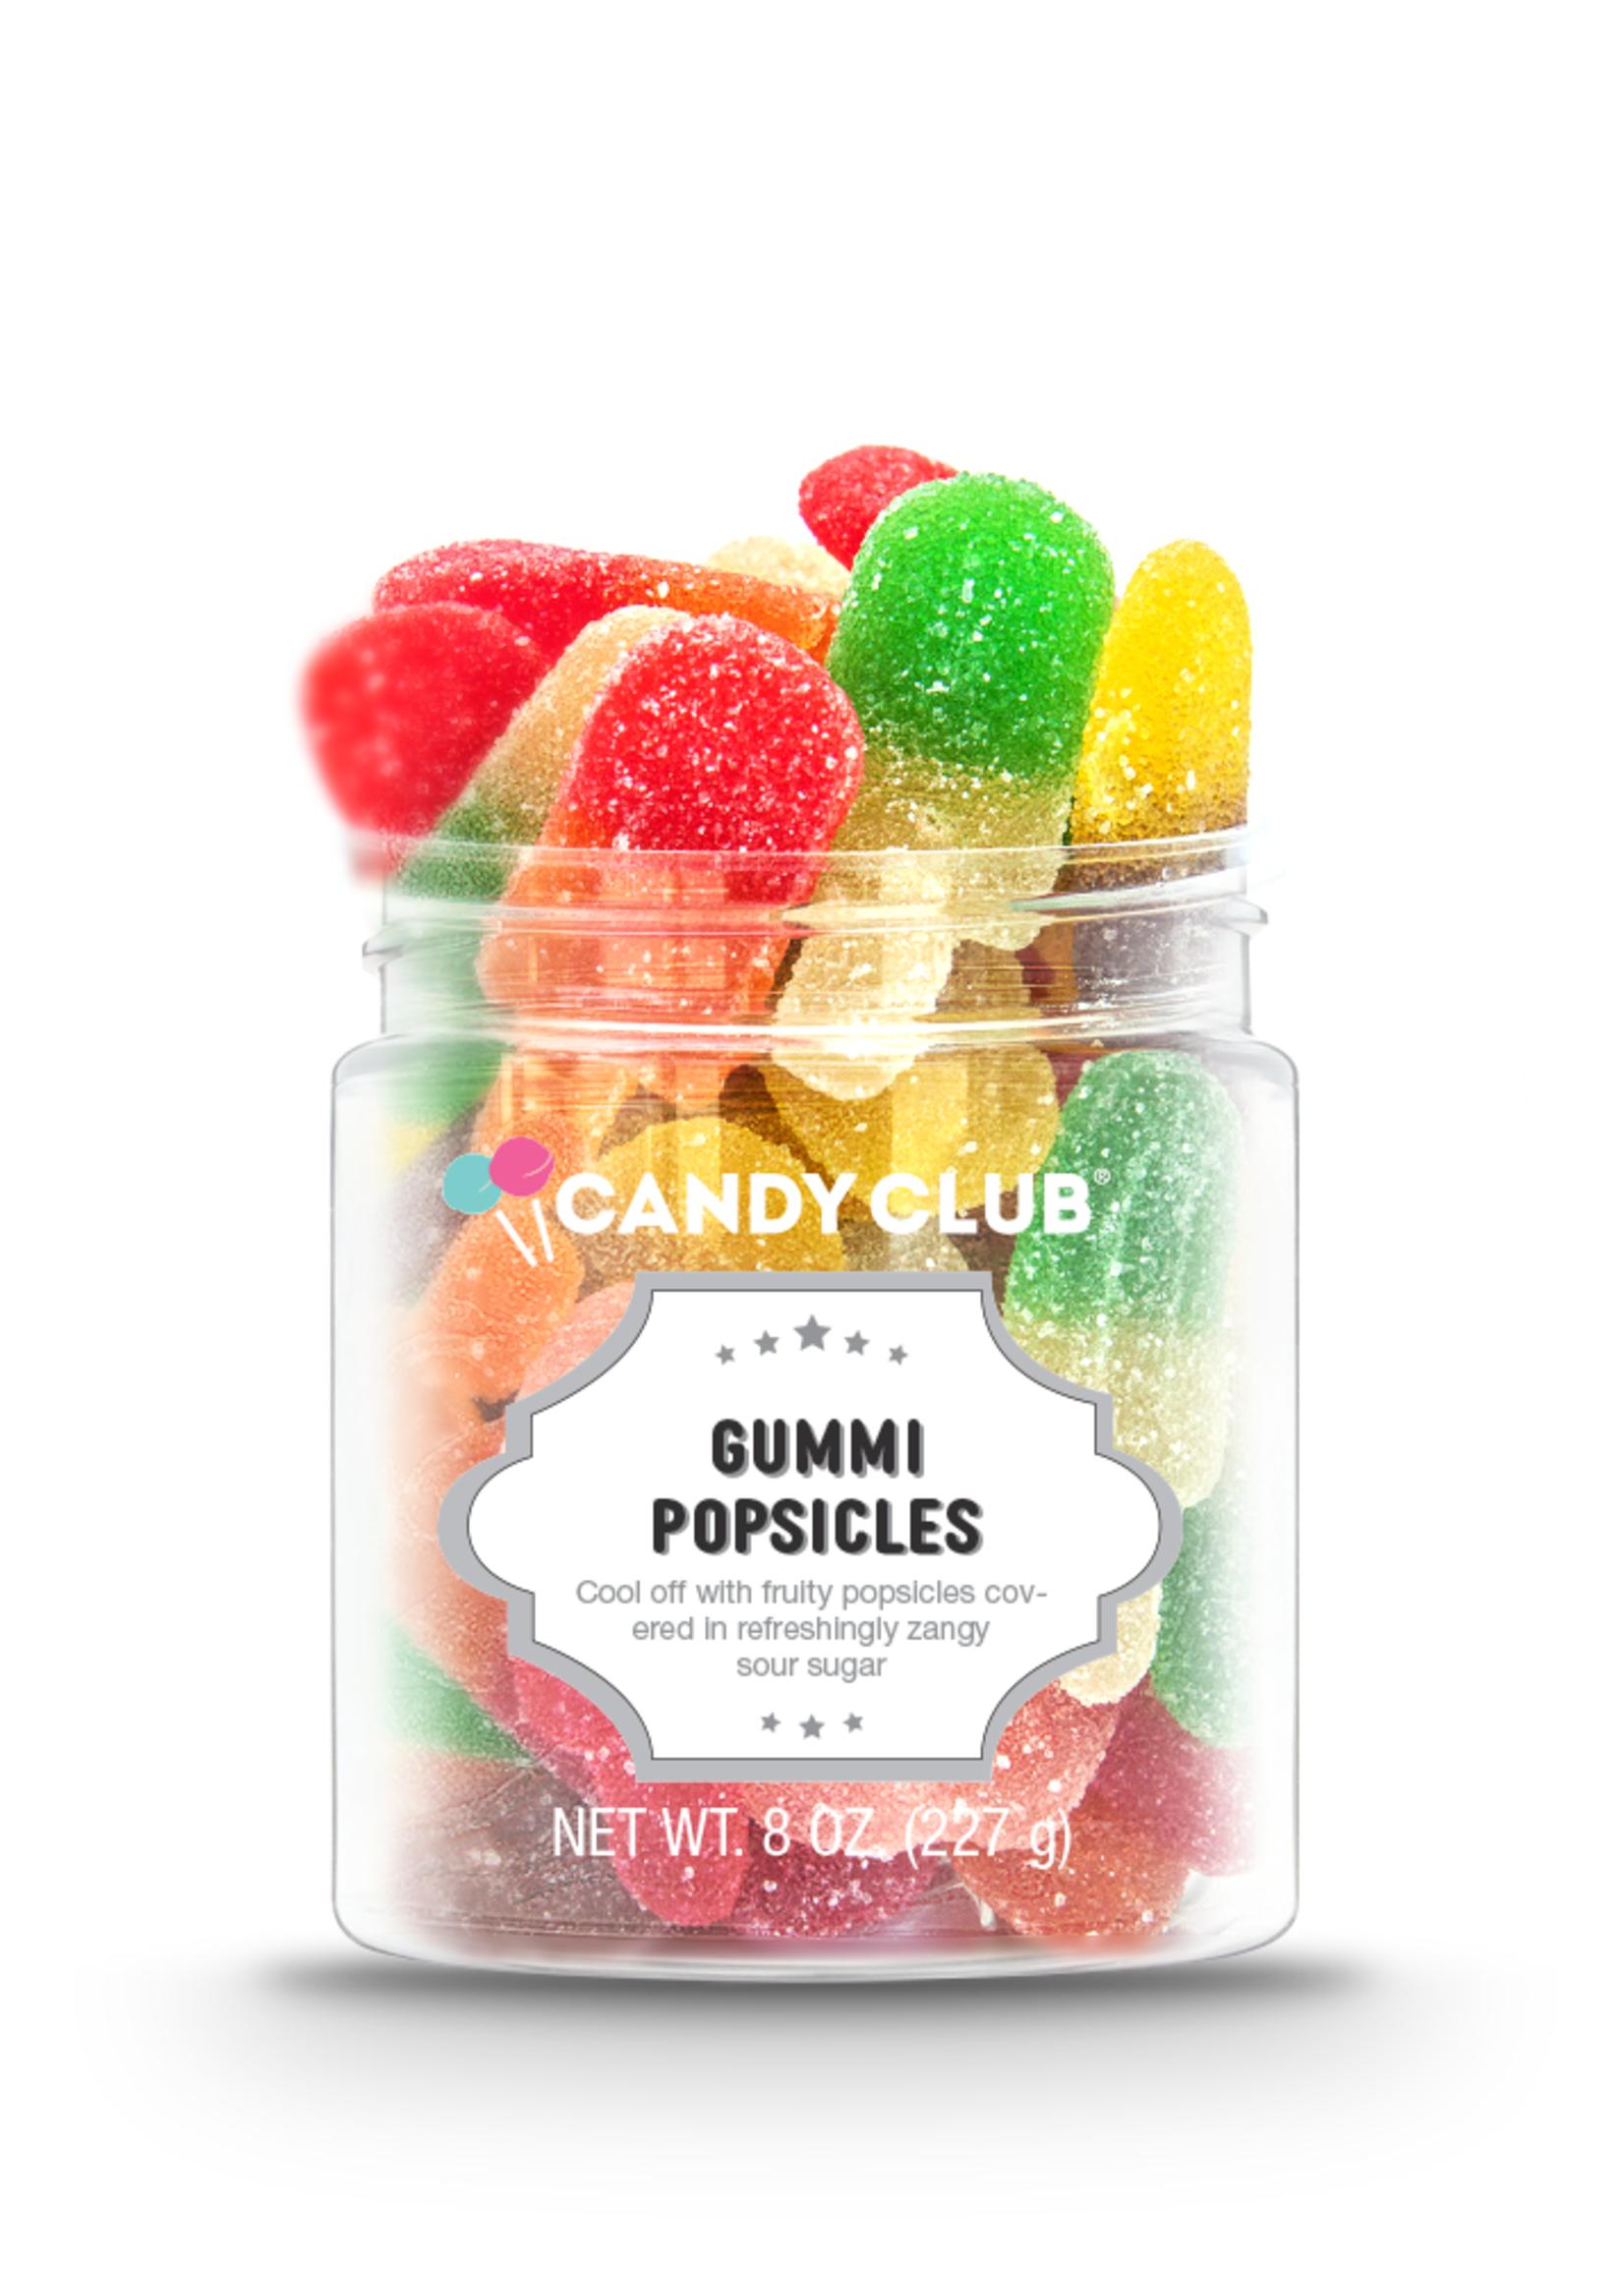 CANDY CLUB CANDY CLUB GUMMI POPSICLES SMALL